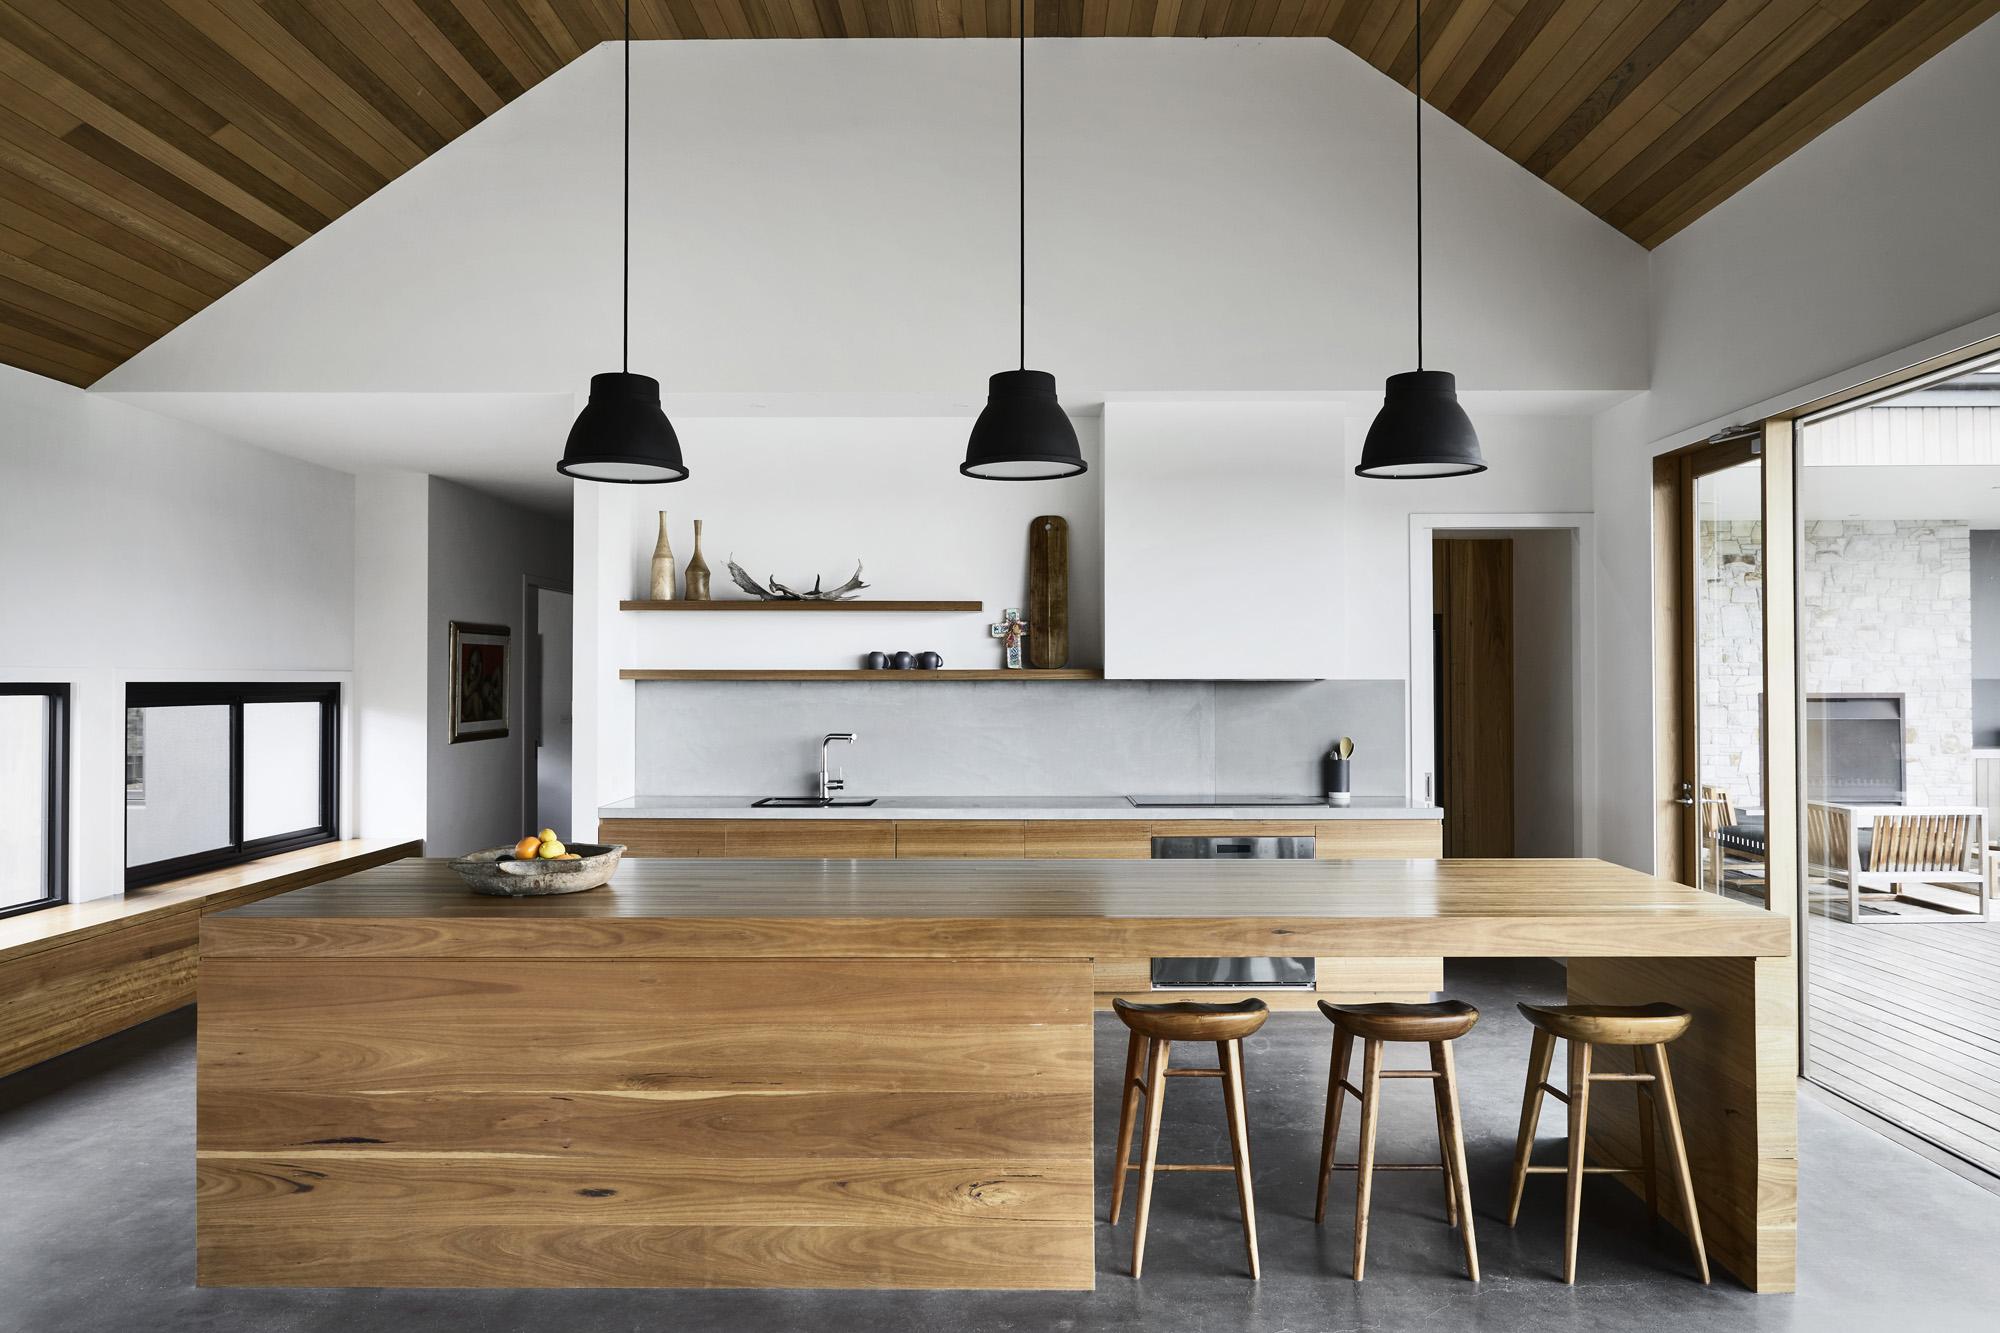 Dan Gayfer Design - MINI Australia - Feature Intervew - Australian Architecture - Ceres House, Victoria - Image 7